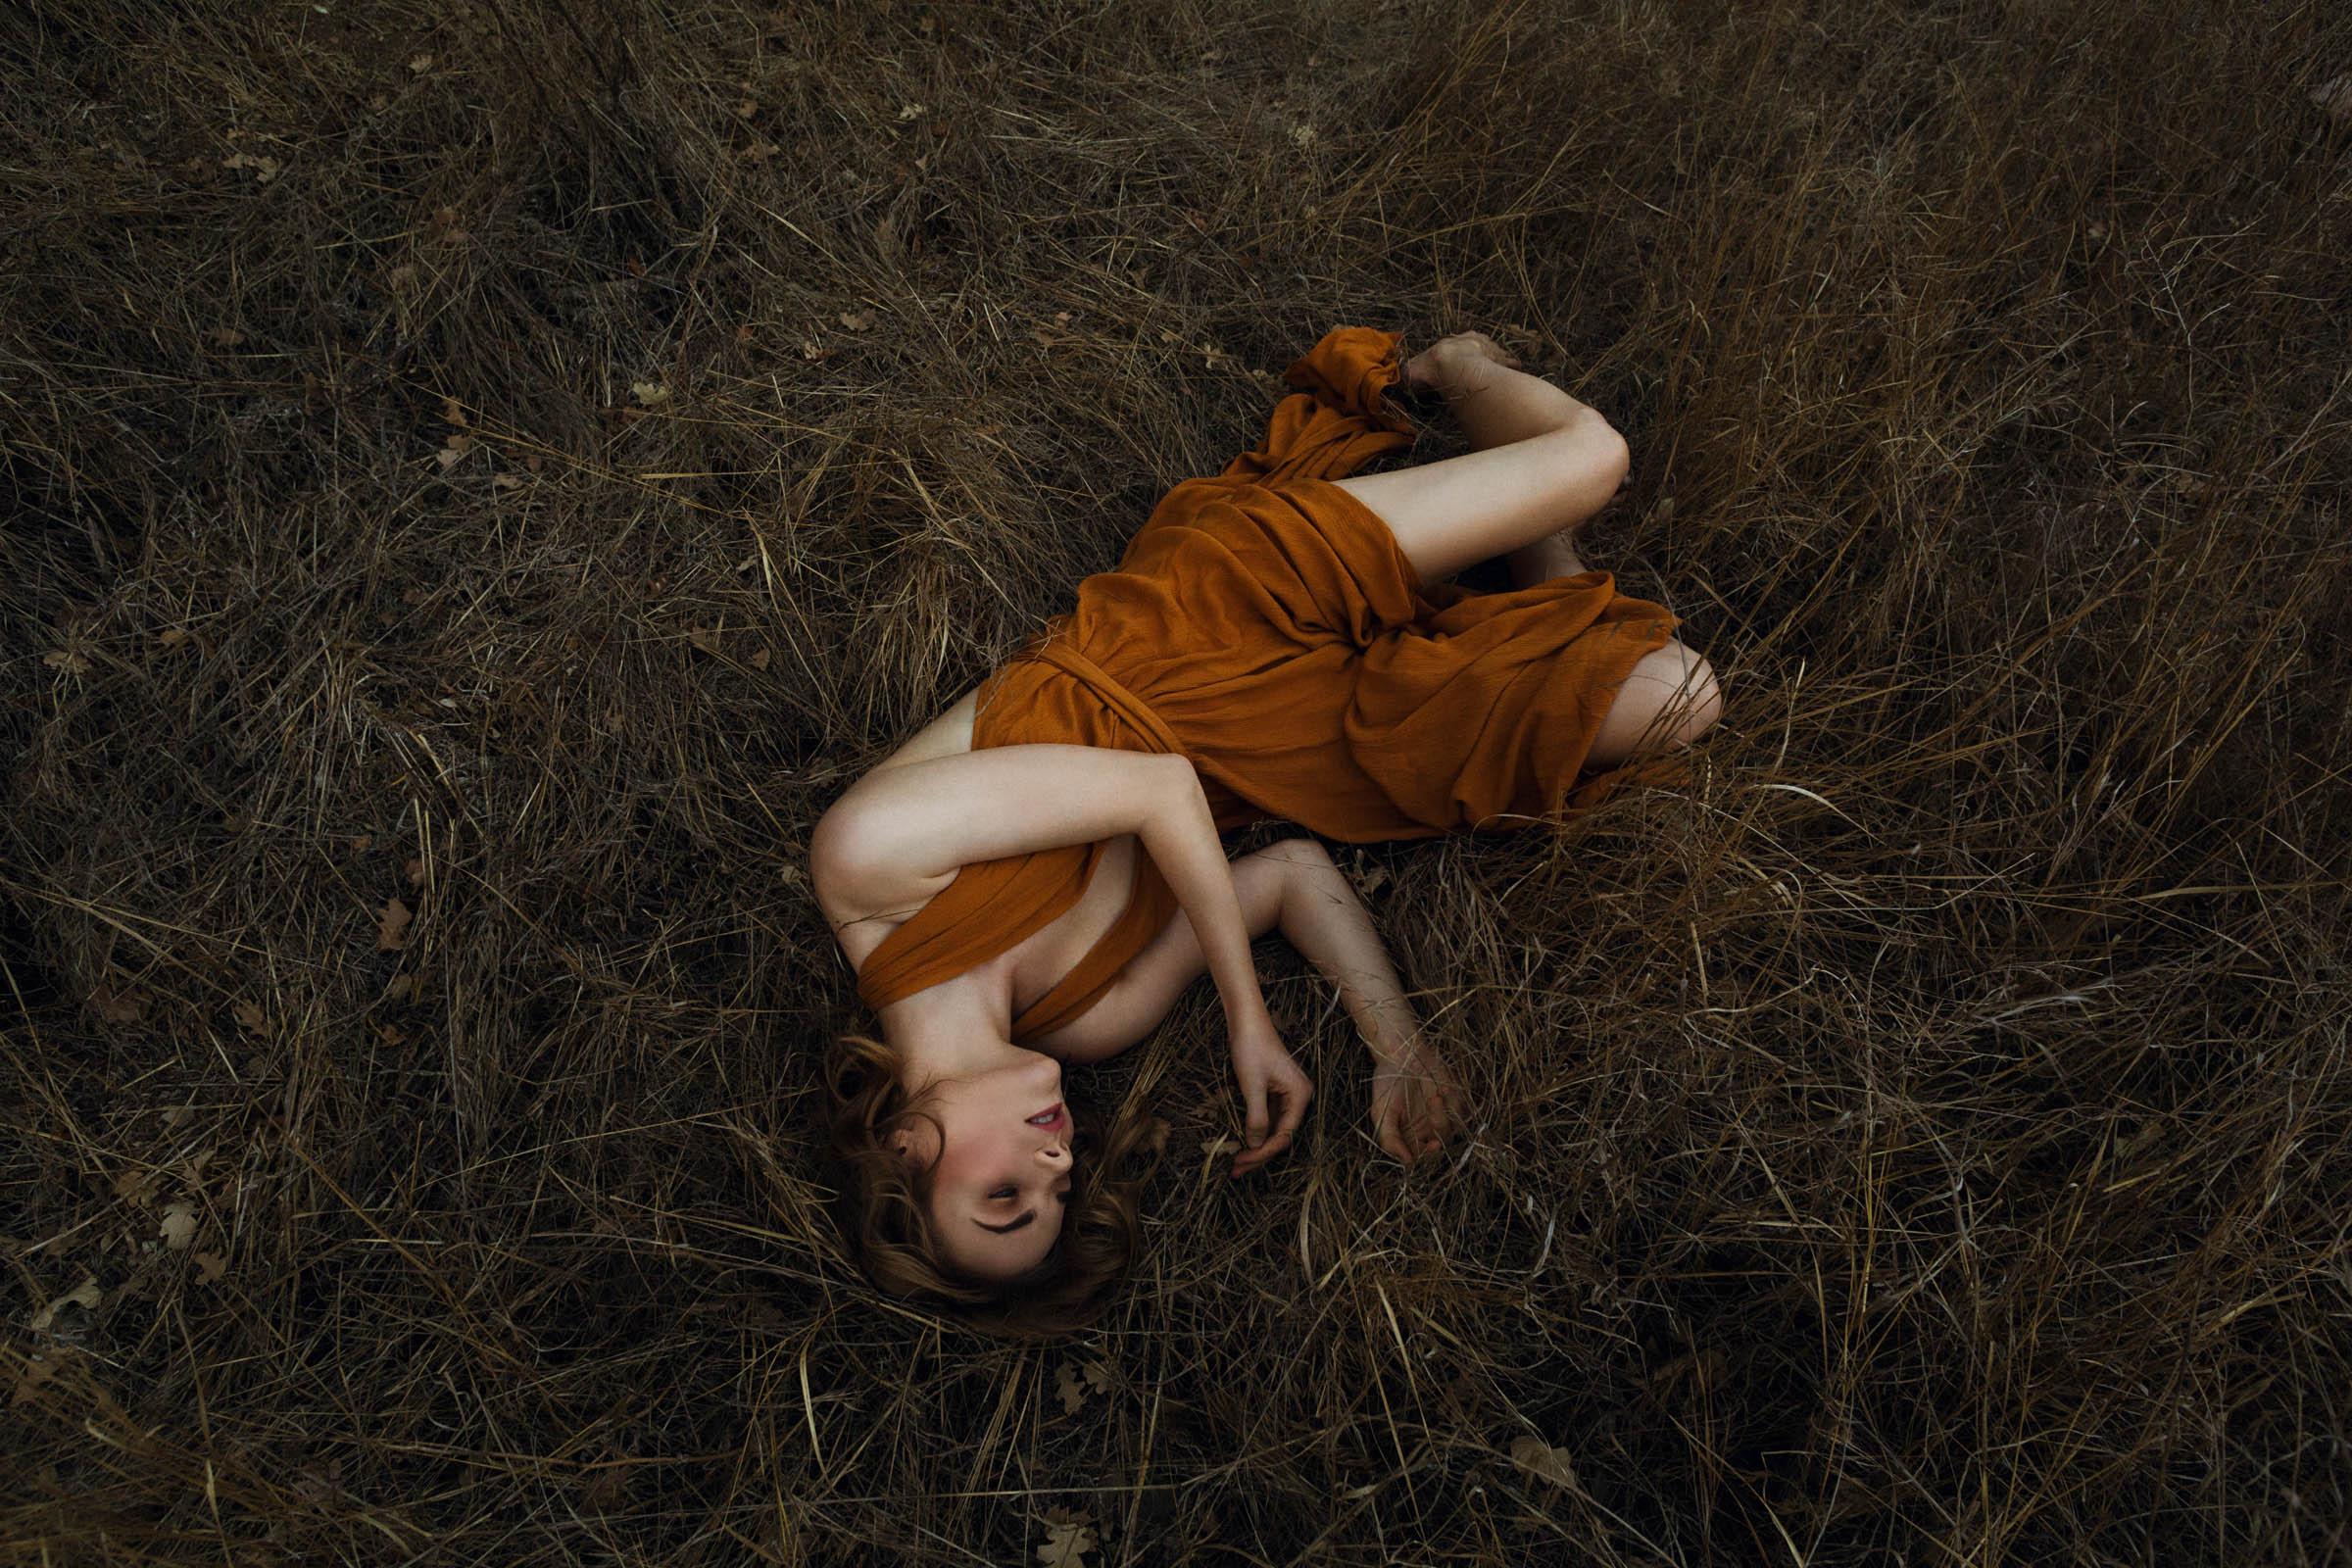 meredith-grass-011.jpg